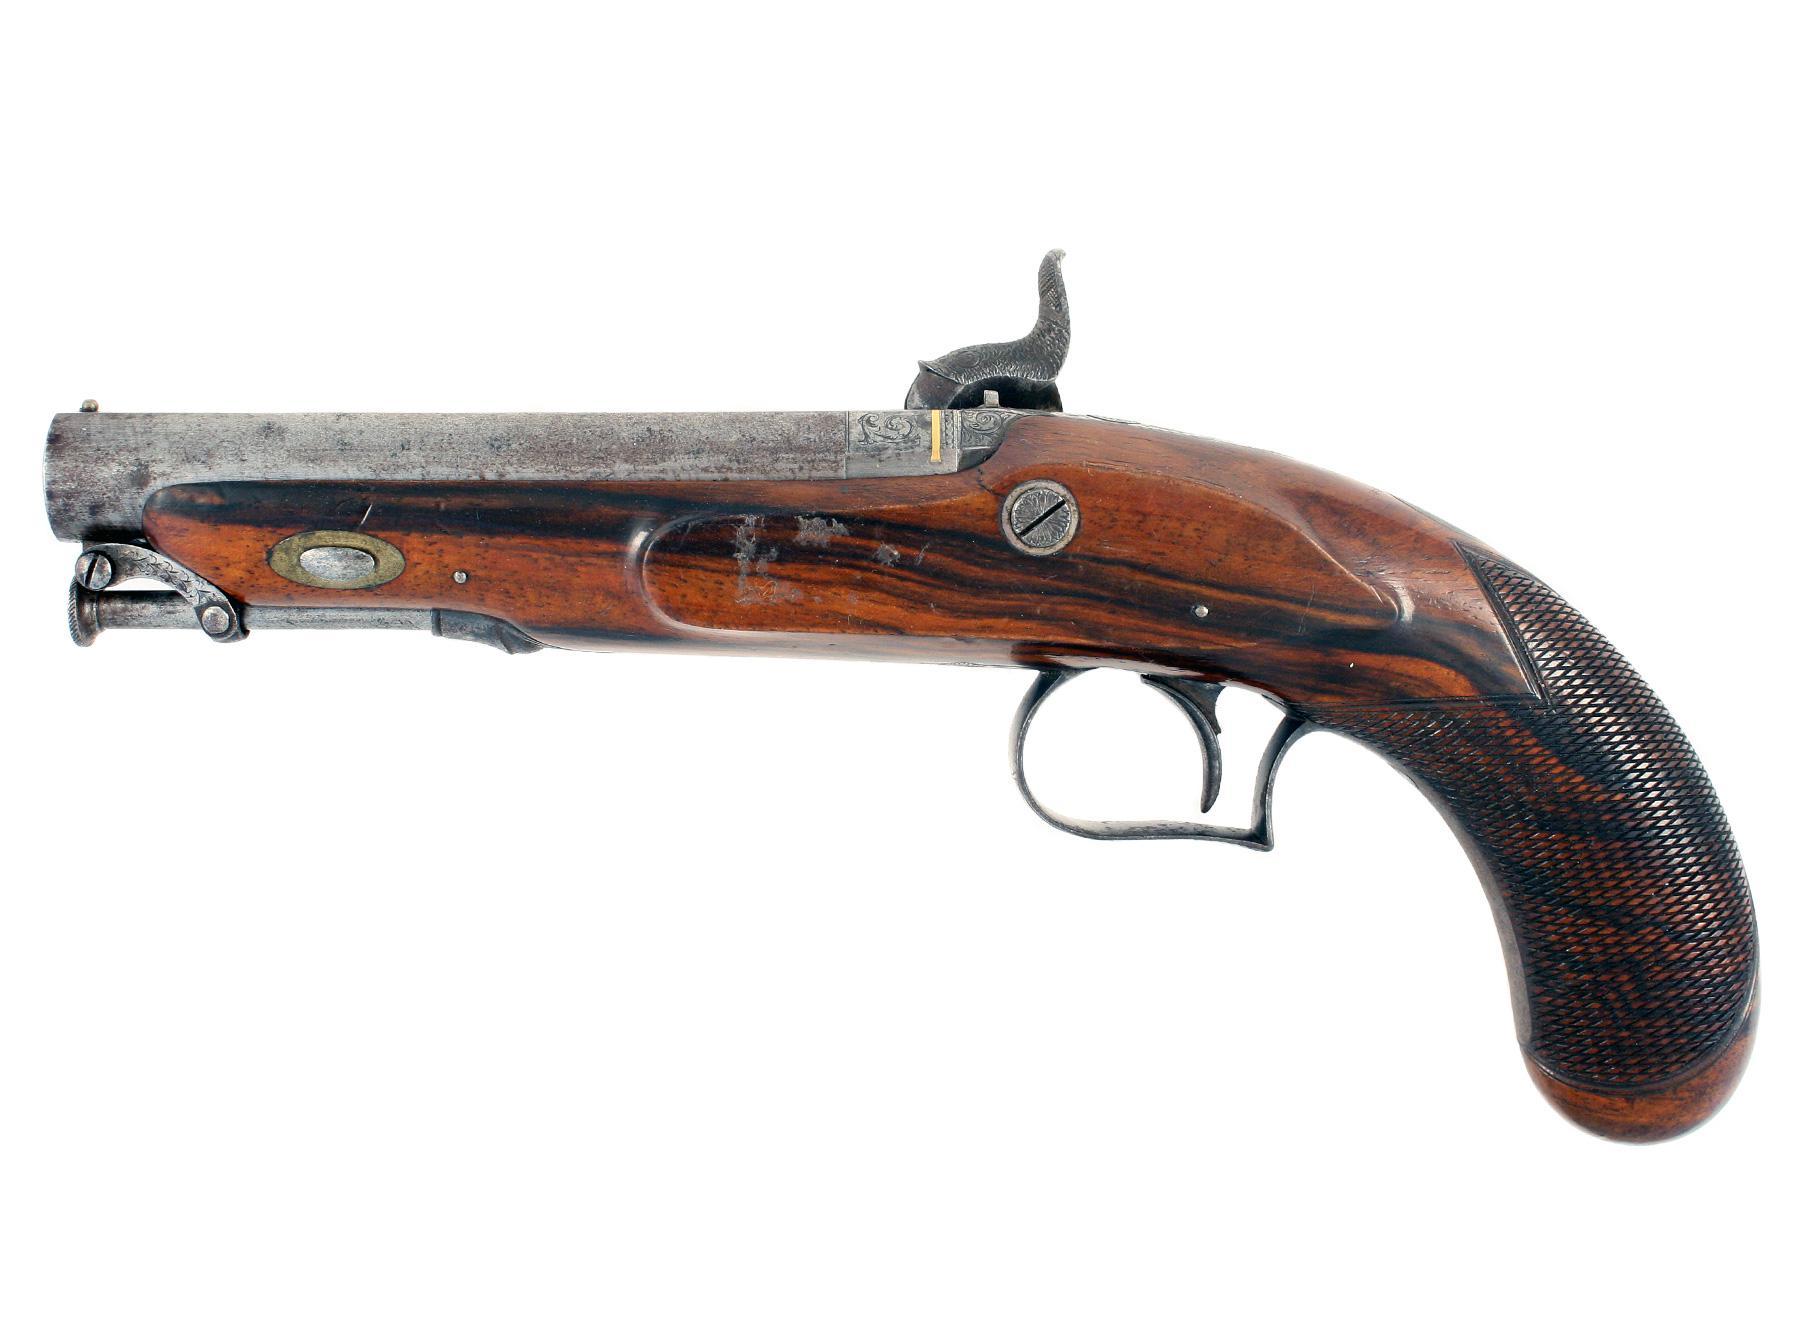 A Cased Pair of Presentation Pistols